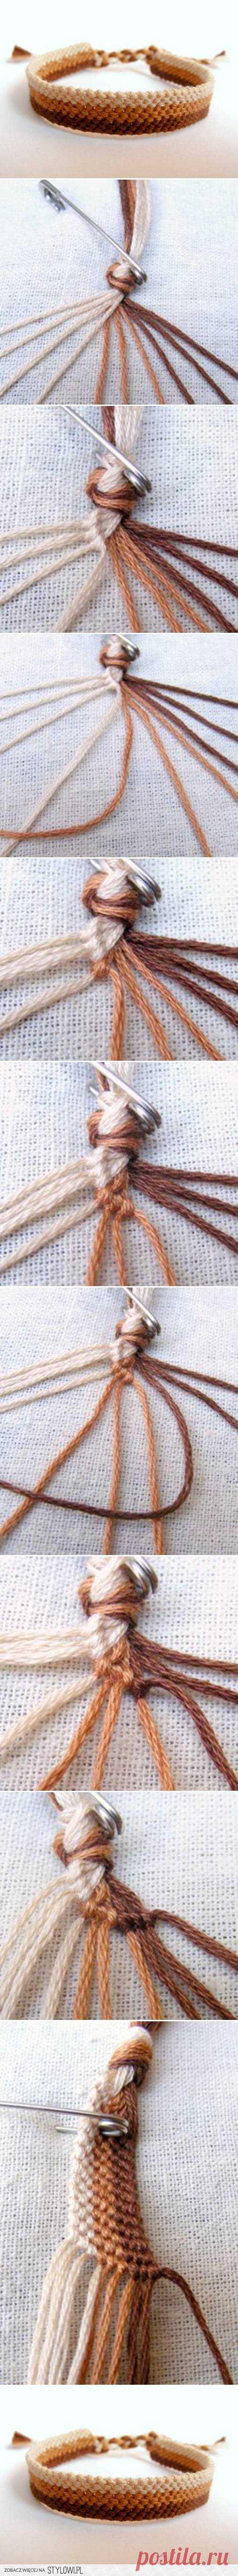 DIY Easy Weave Bracelet DIY Projects   UsefulDIY.com na Stylowi.pl